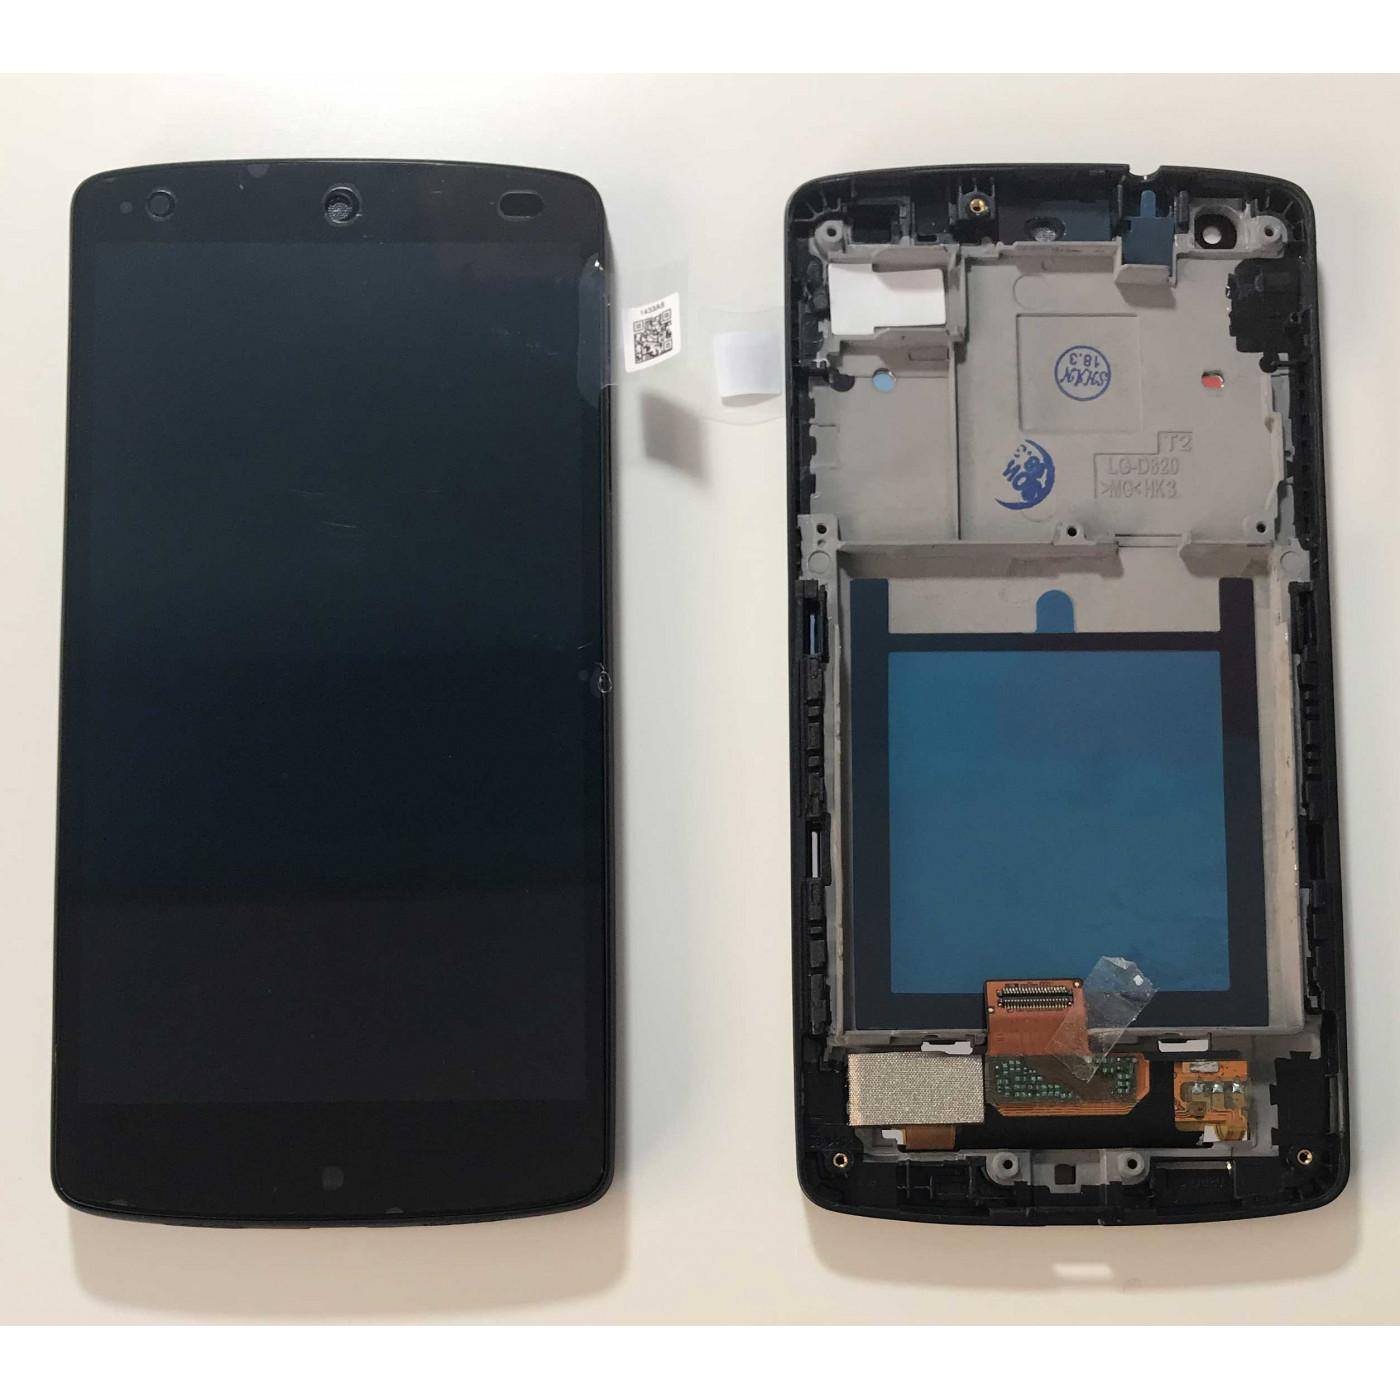 DISPLAY LCD PARI ORIGINALE Per LG Google Nexus 5 D820 D821 Nero FRAME TOUCH SCREEN VETRO